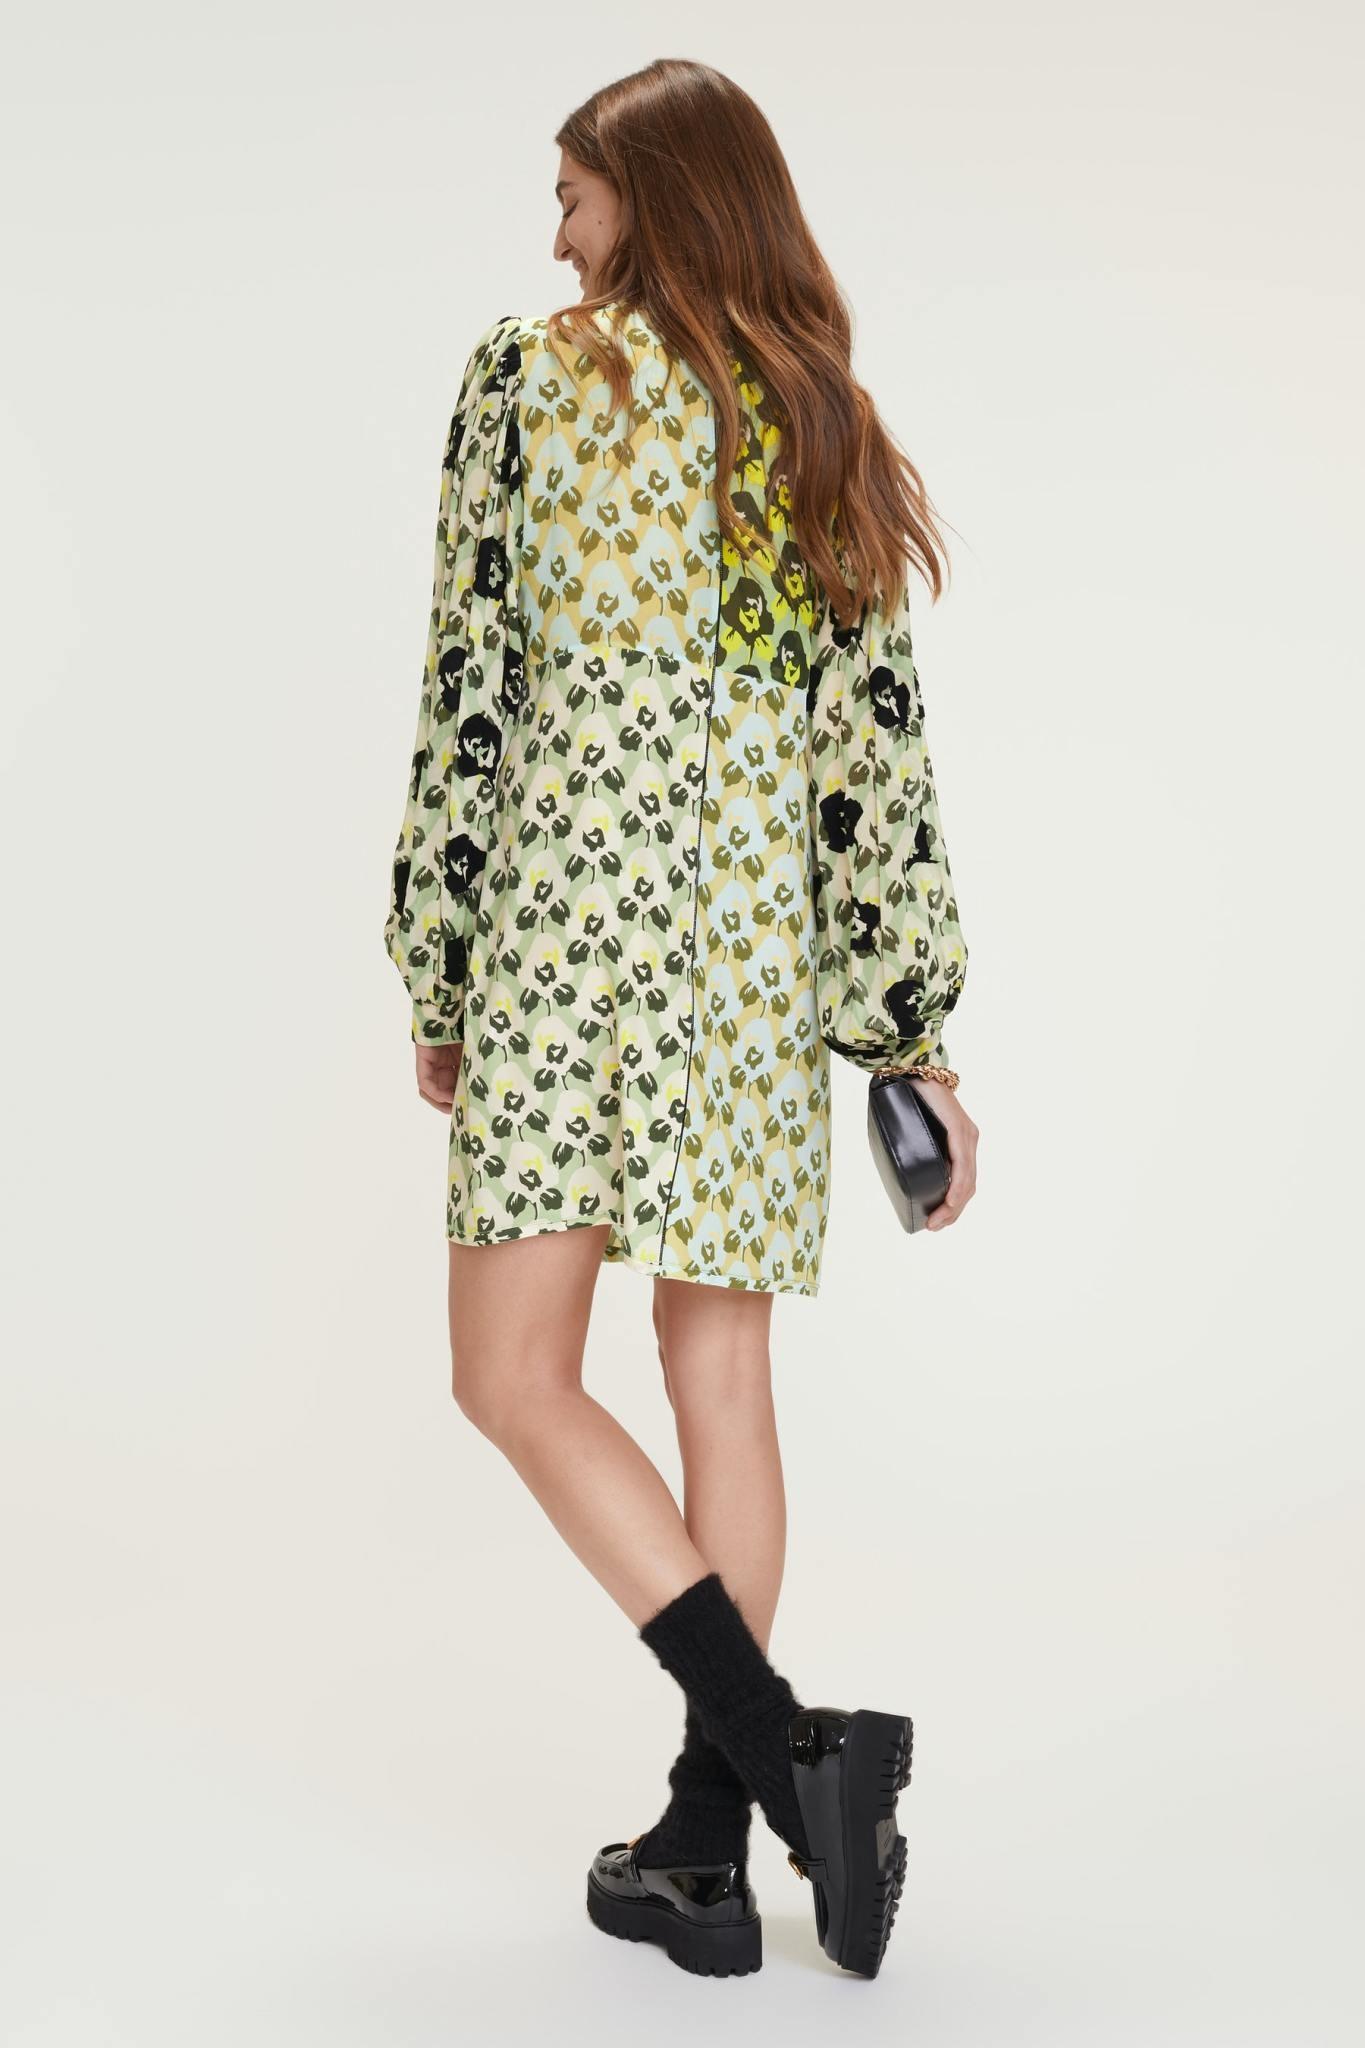 Flower patch dress Dorothee Schumacher-2